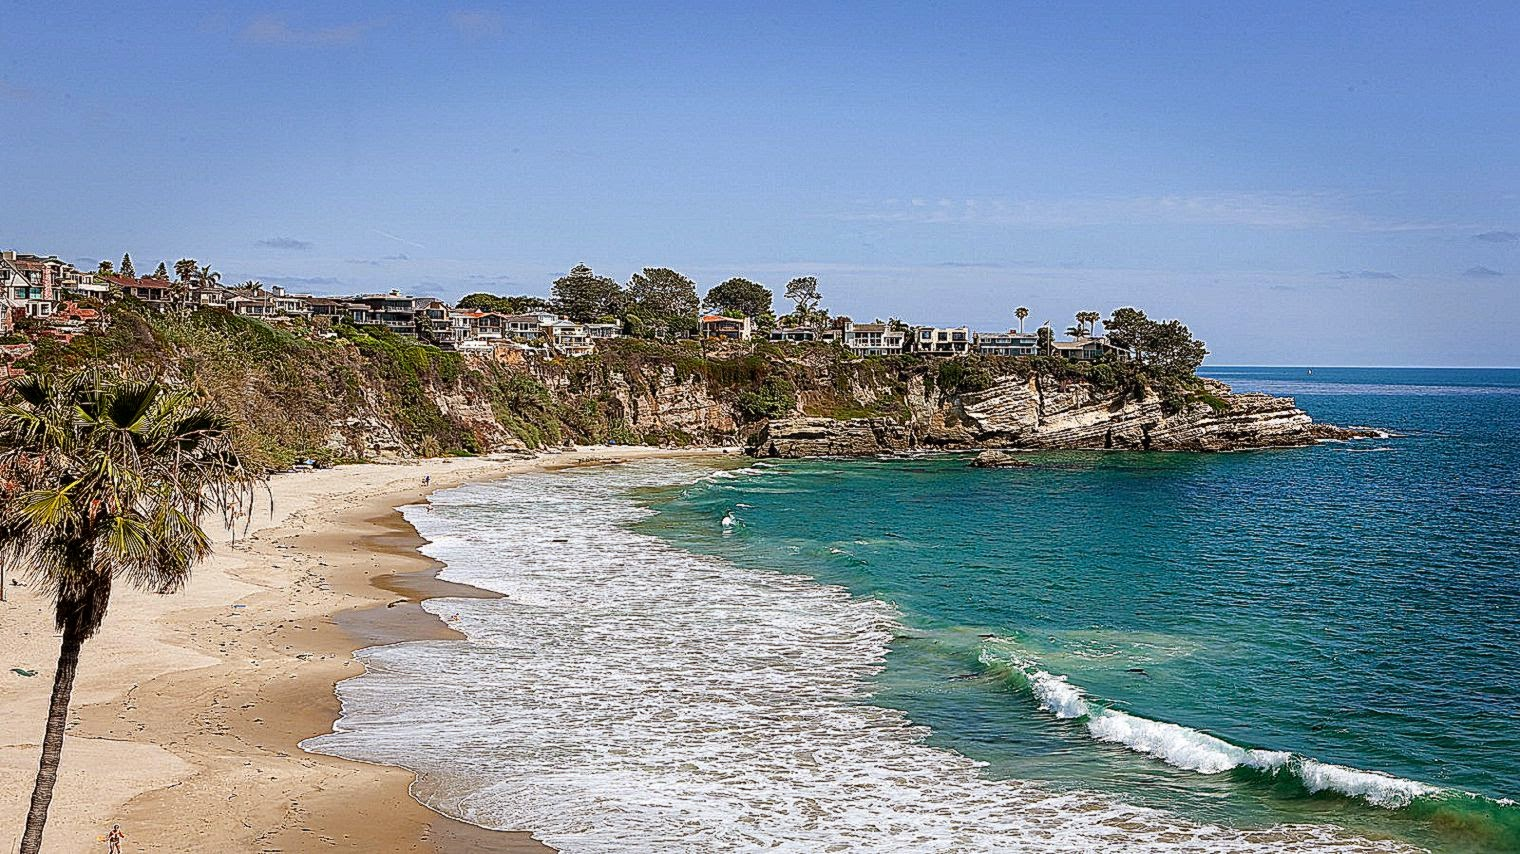 Laguna beach best beach pictures for Laguna beach properties for sale